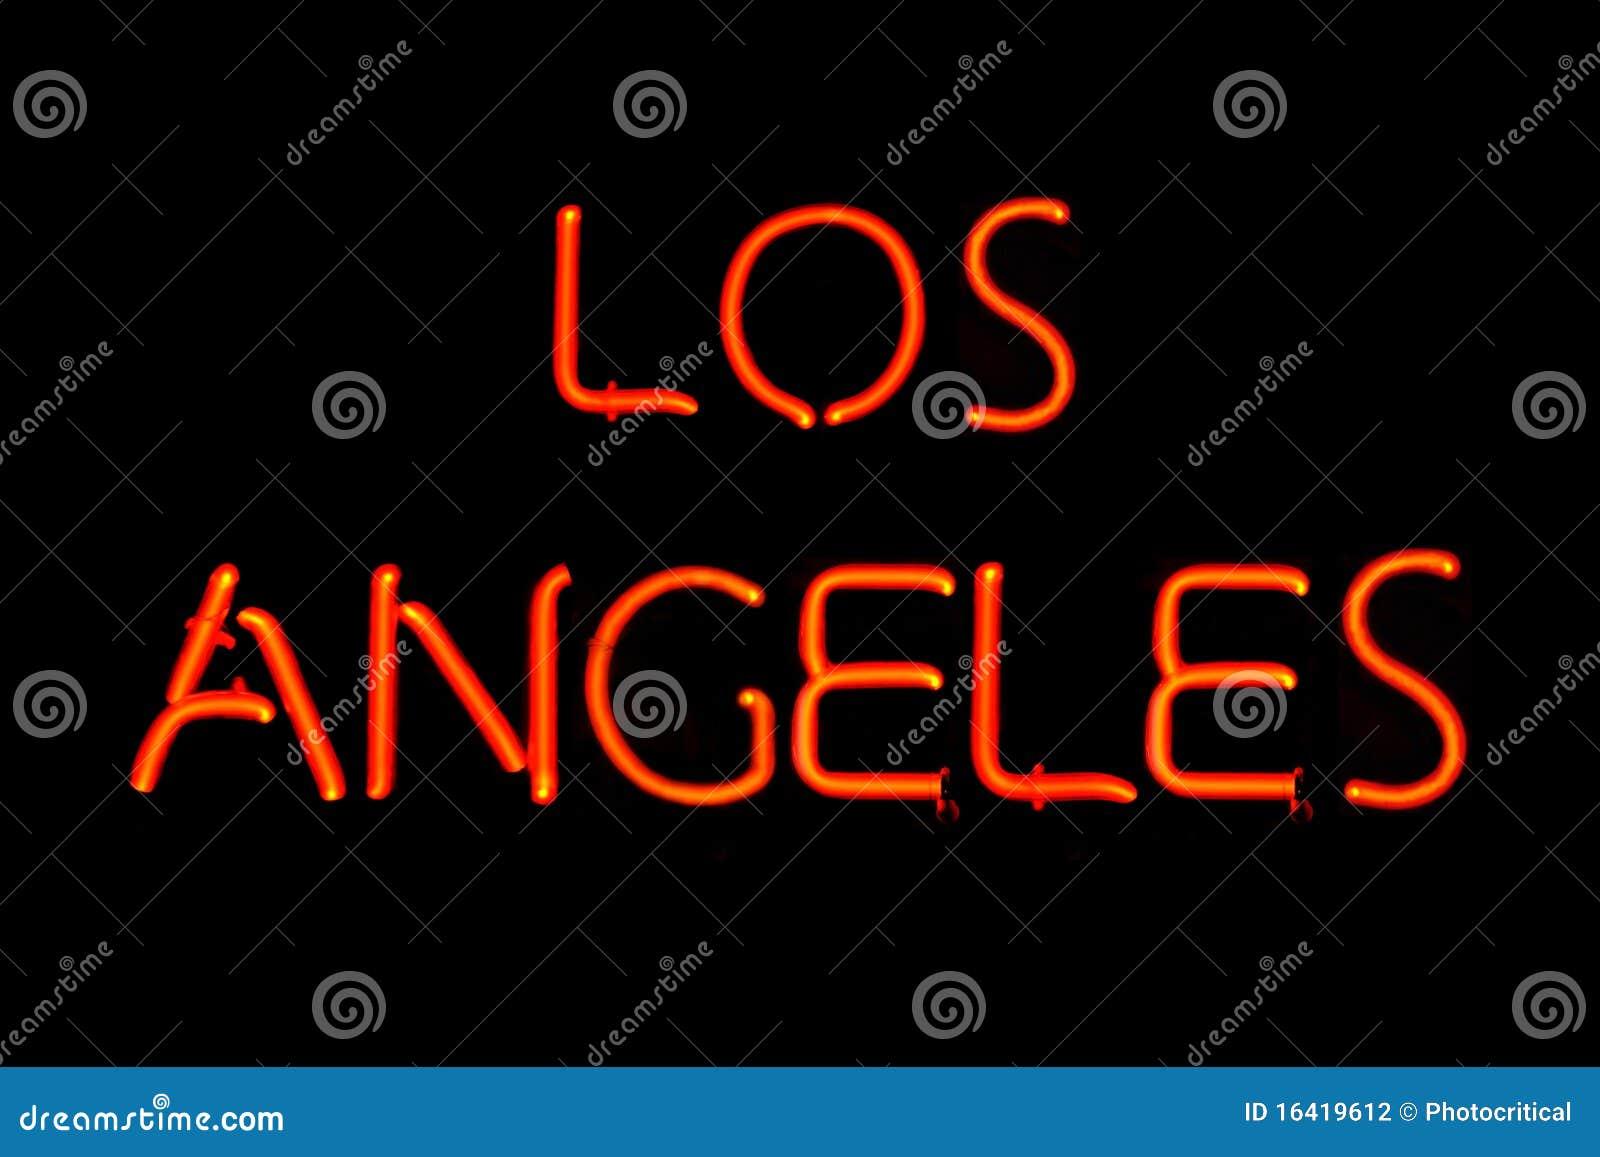 Los Angeles Neon Sign Stock Photo Image Of Illuminated